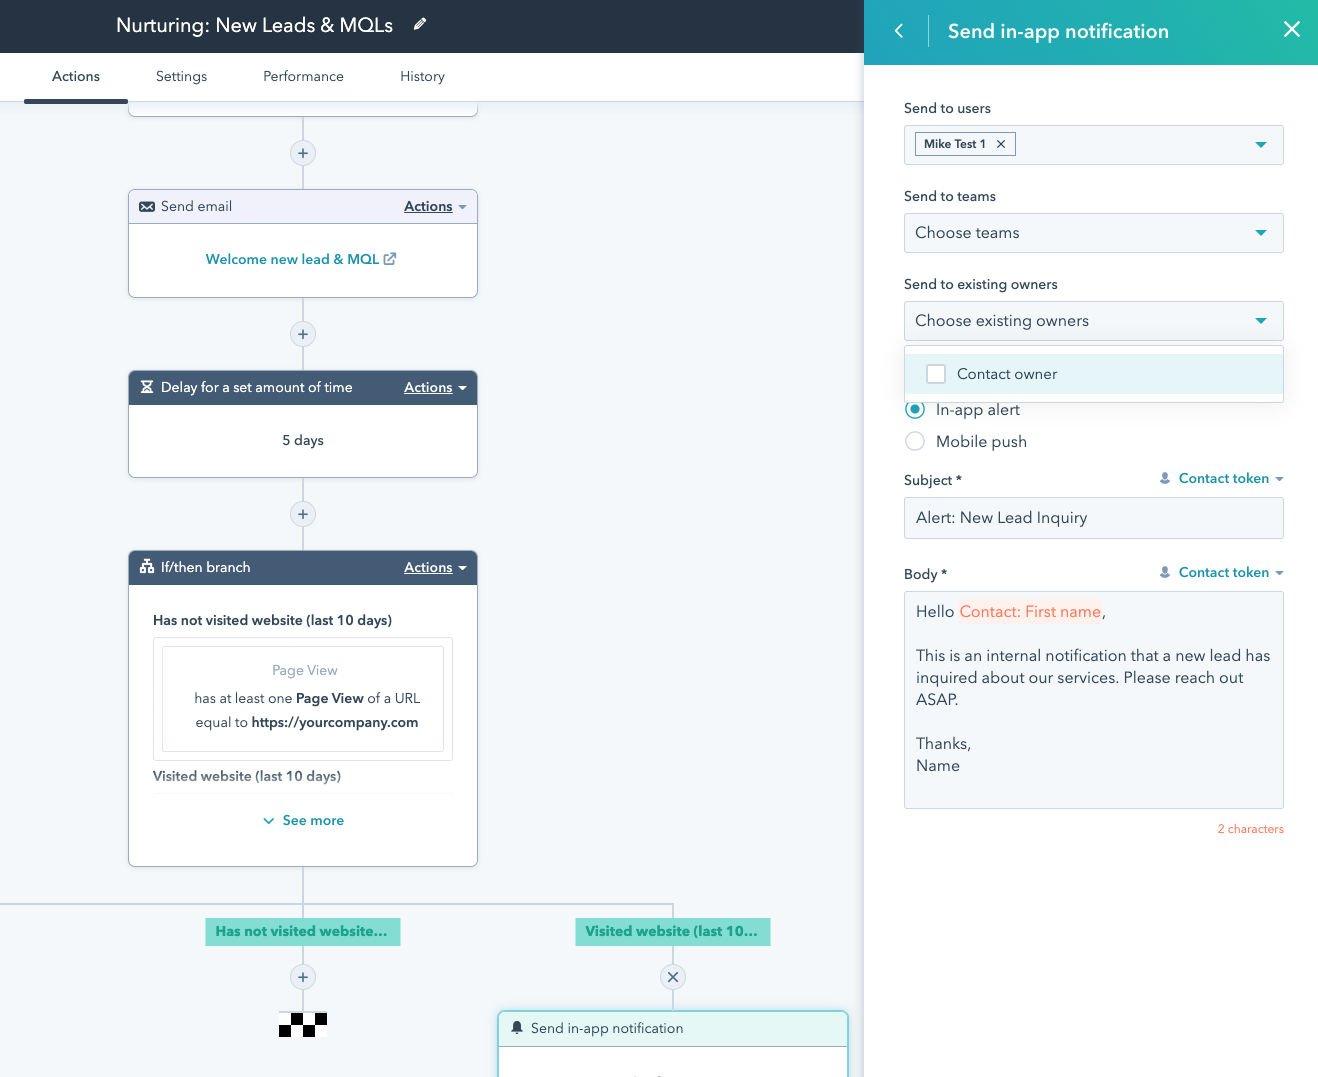 hubspot-marketing-automation-voorbeeld